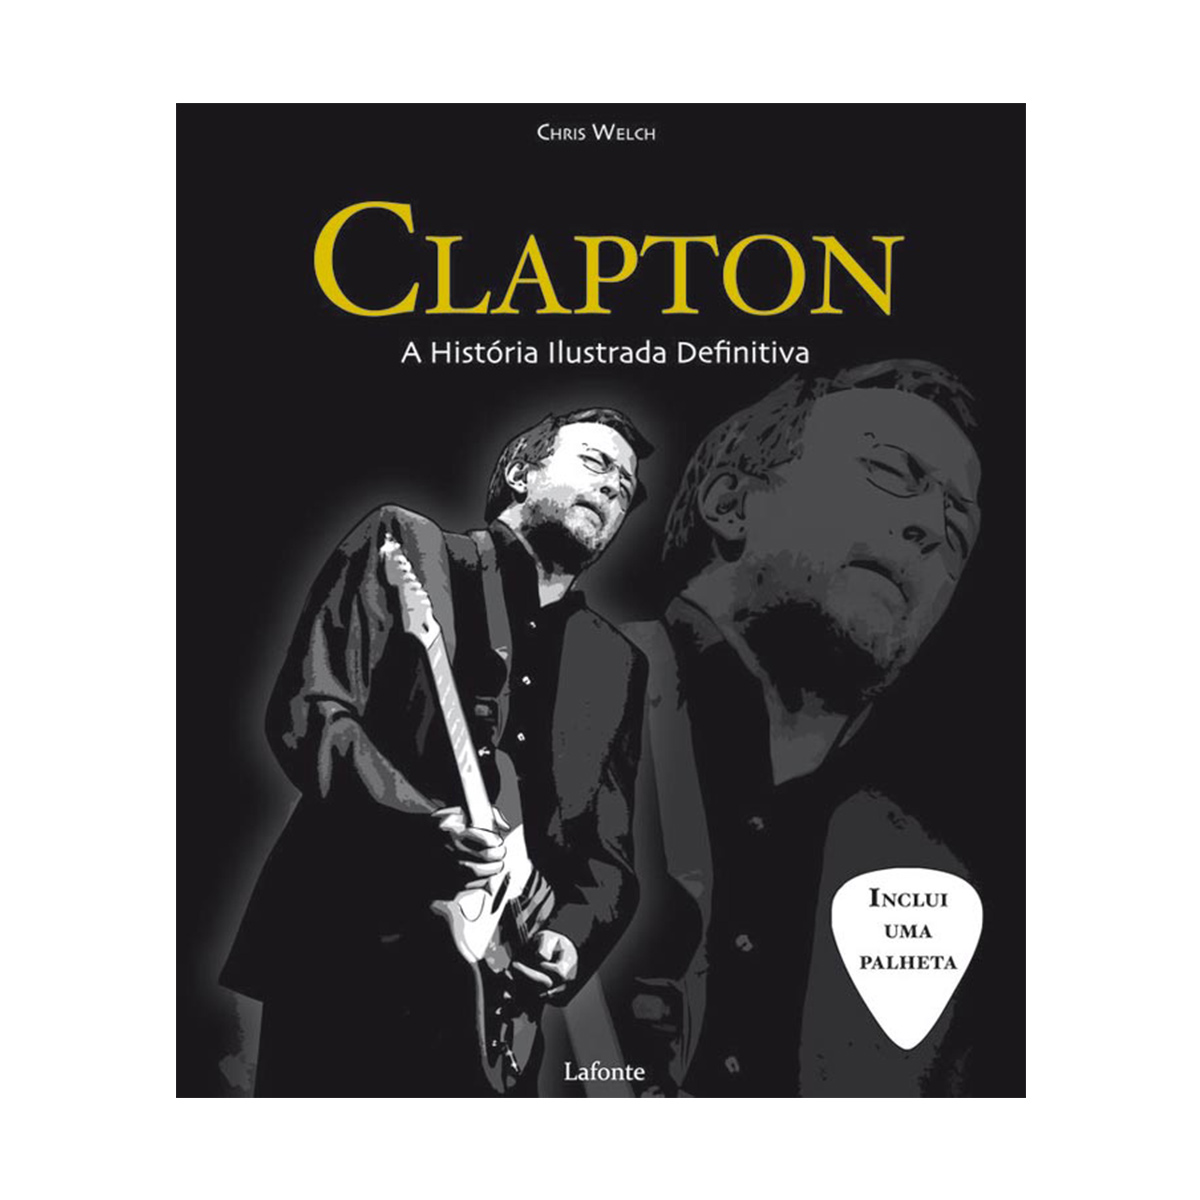 Livro Clapton A História Ilustrada Definitiva